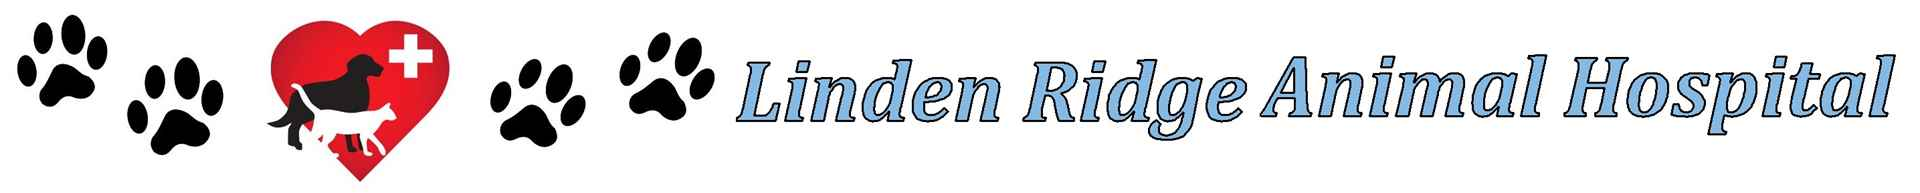 Linden Ridge Animal Hospital